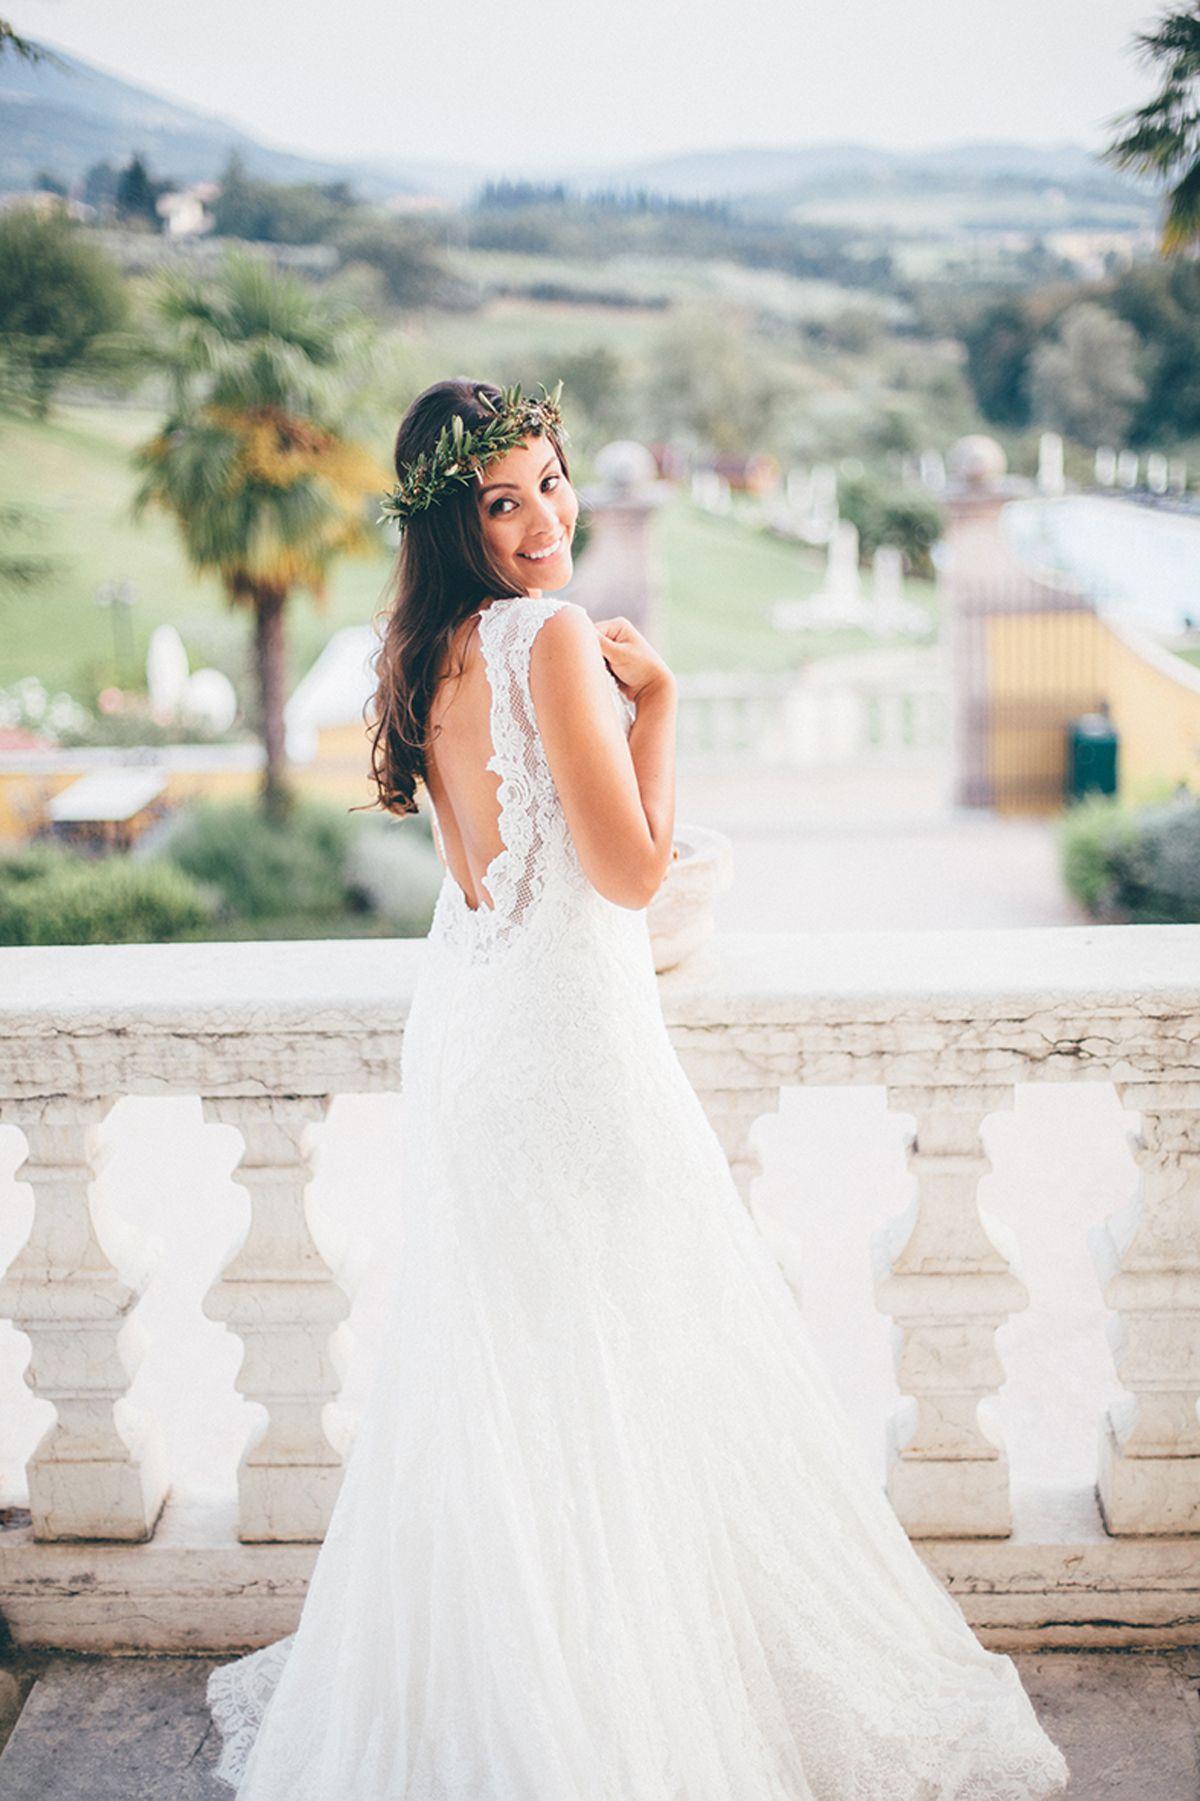 Mediterran Heiraten in Italien | Heiraten in italien ...